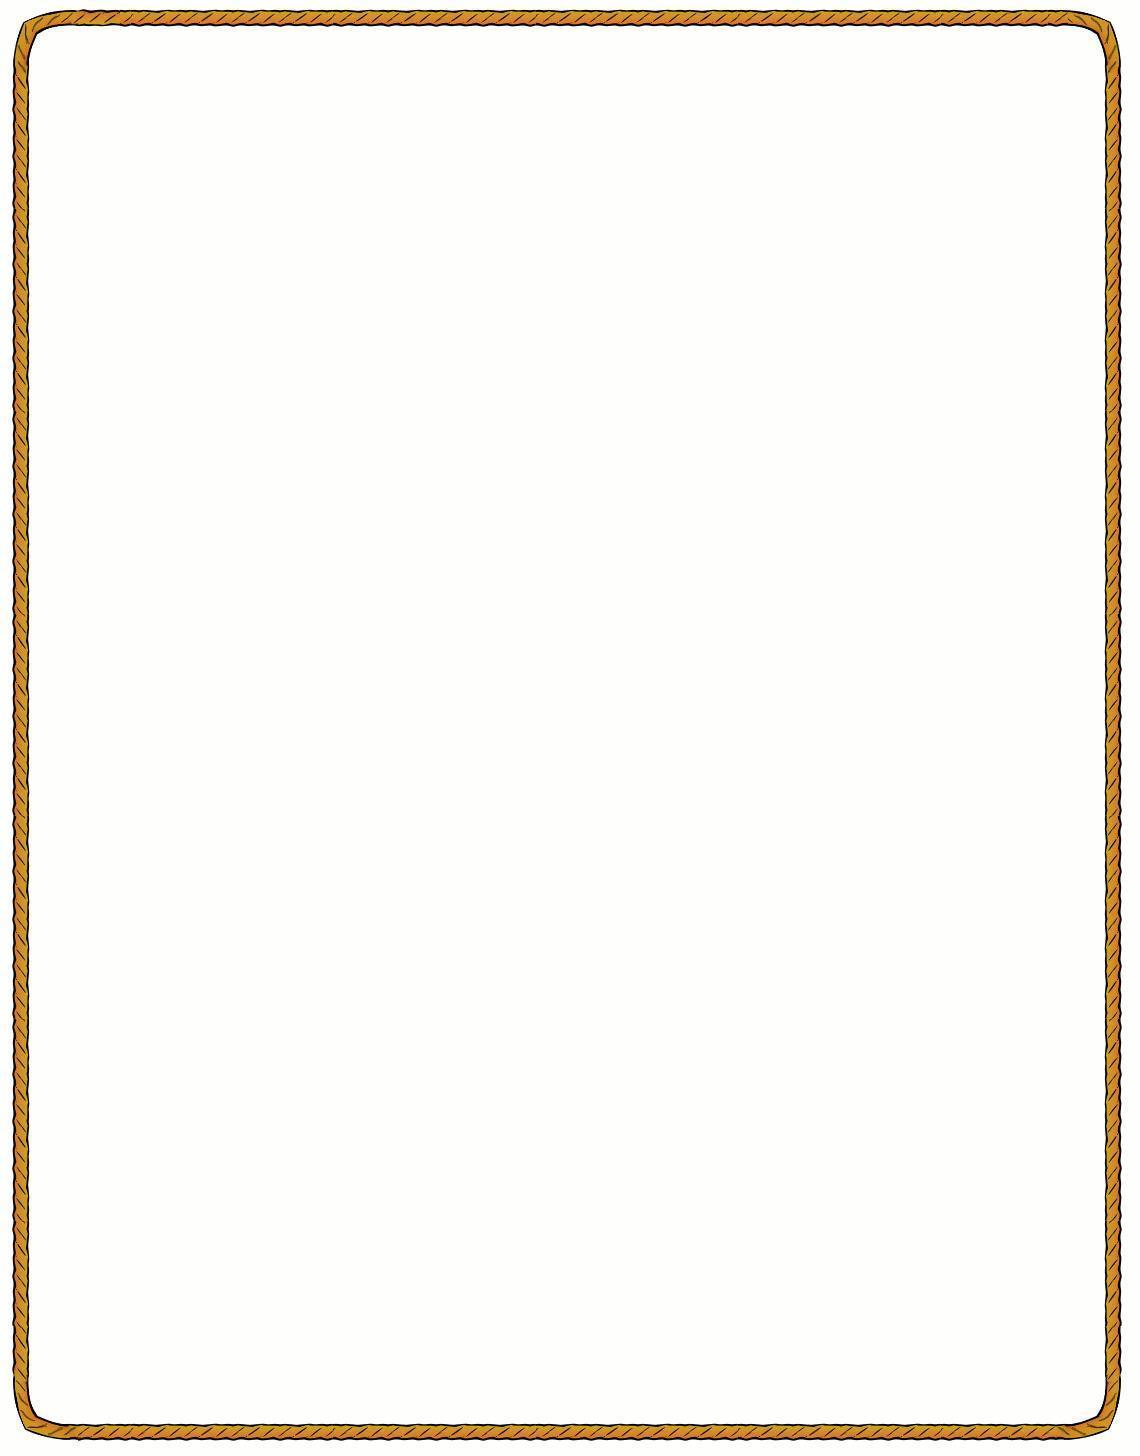 1140x1456 Border Free Clip Art Western Clipart Panda